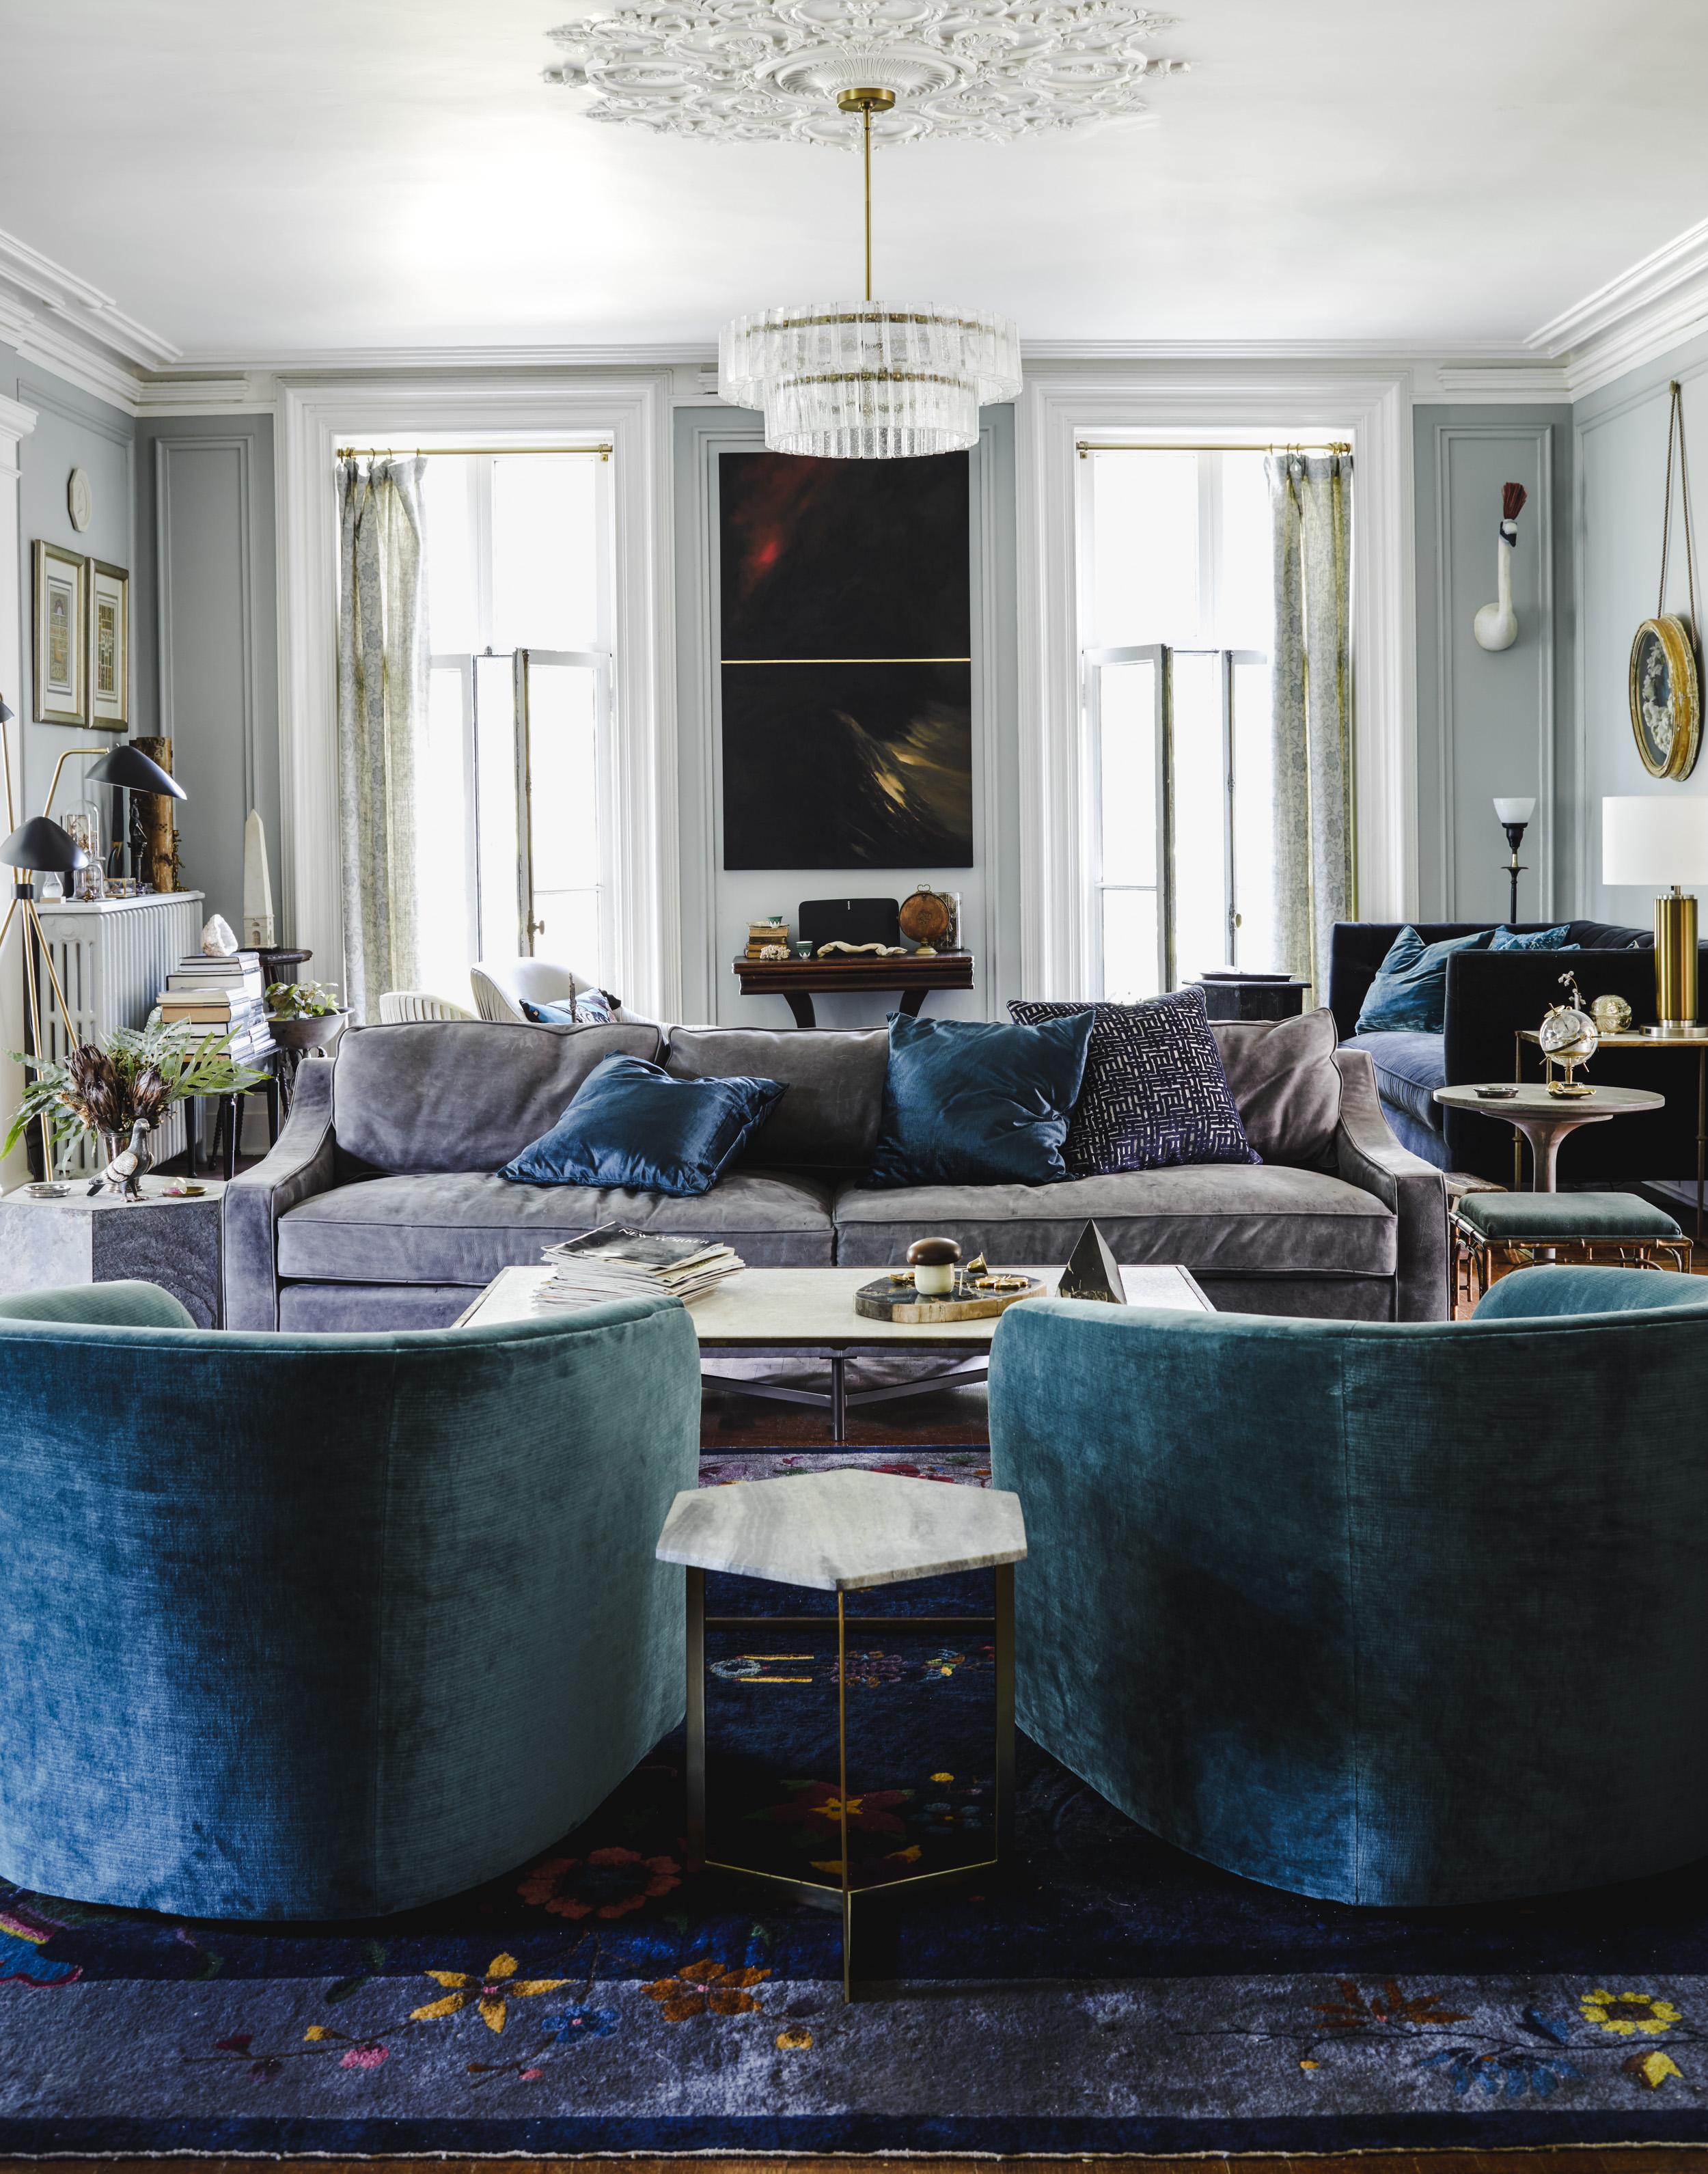 19_Livingroom_A_052.jpg